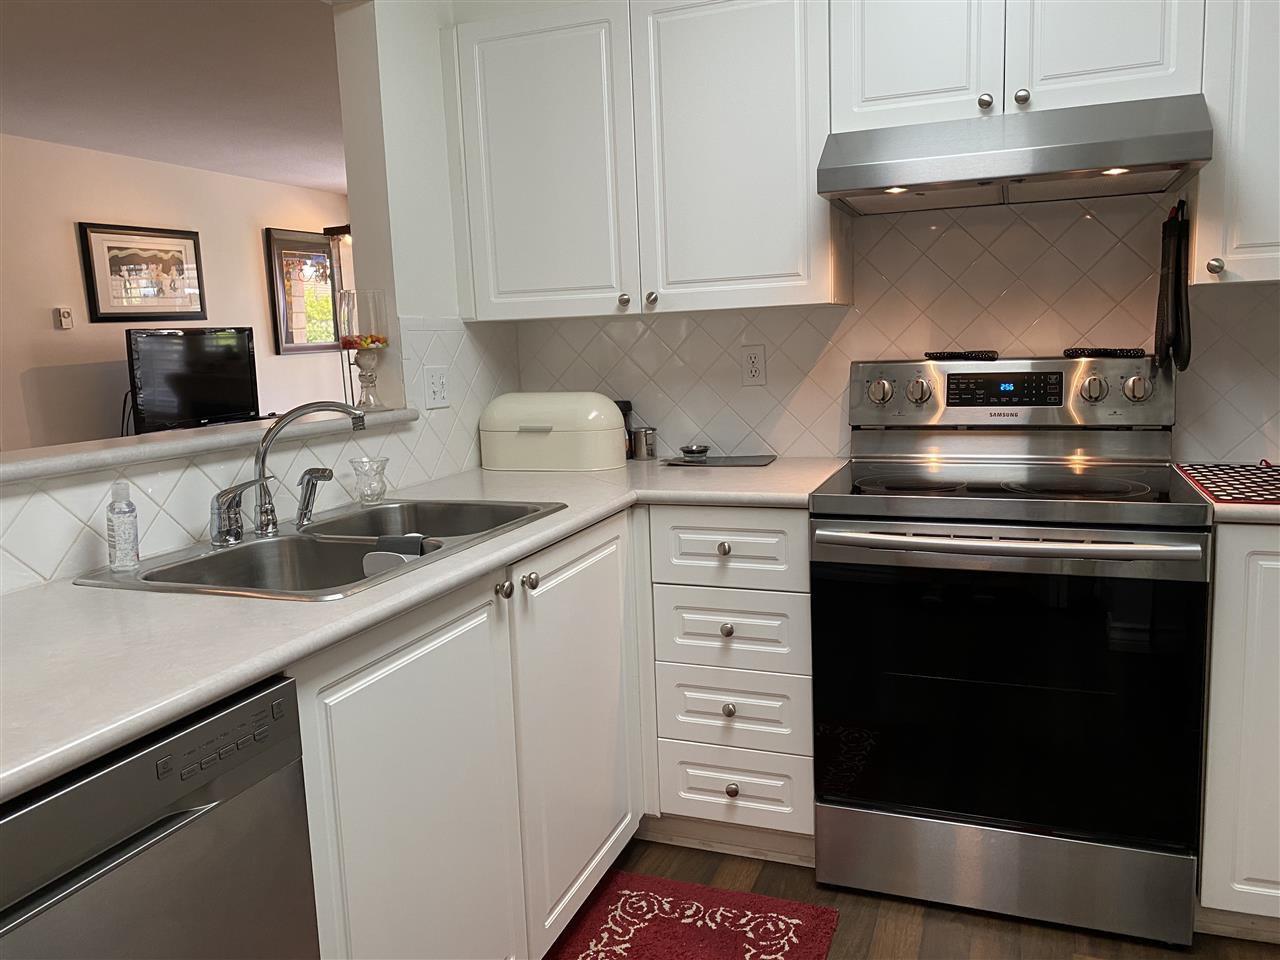 Photo 12: Photos: 304 1369 56 STREET in Delta: Cliff Drive Condo for sale (Tsawwassen)  : MLS®# R2464890